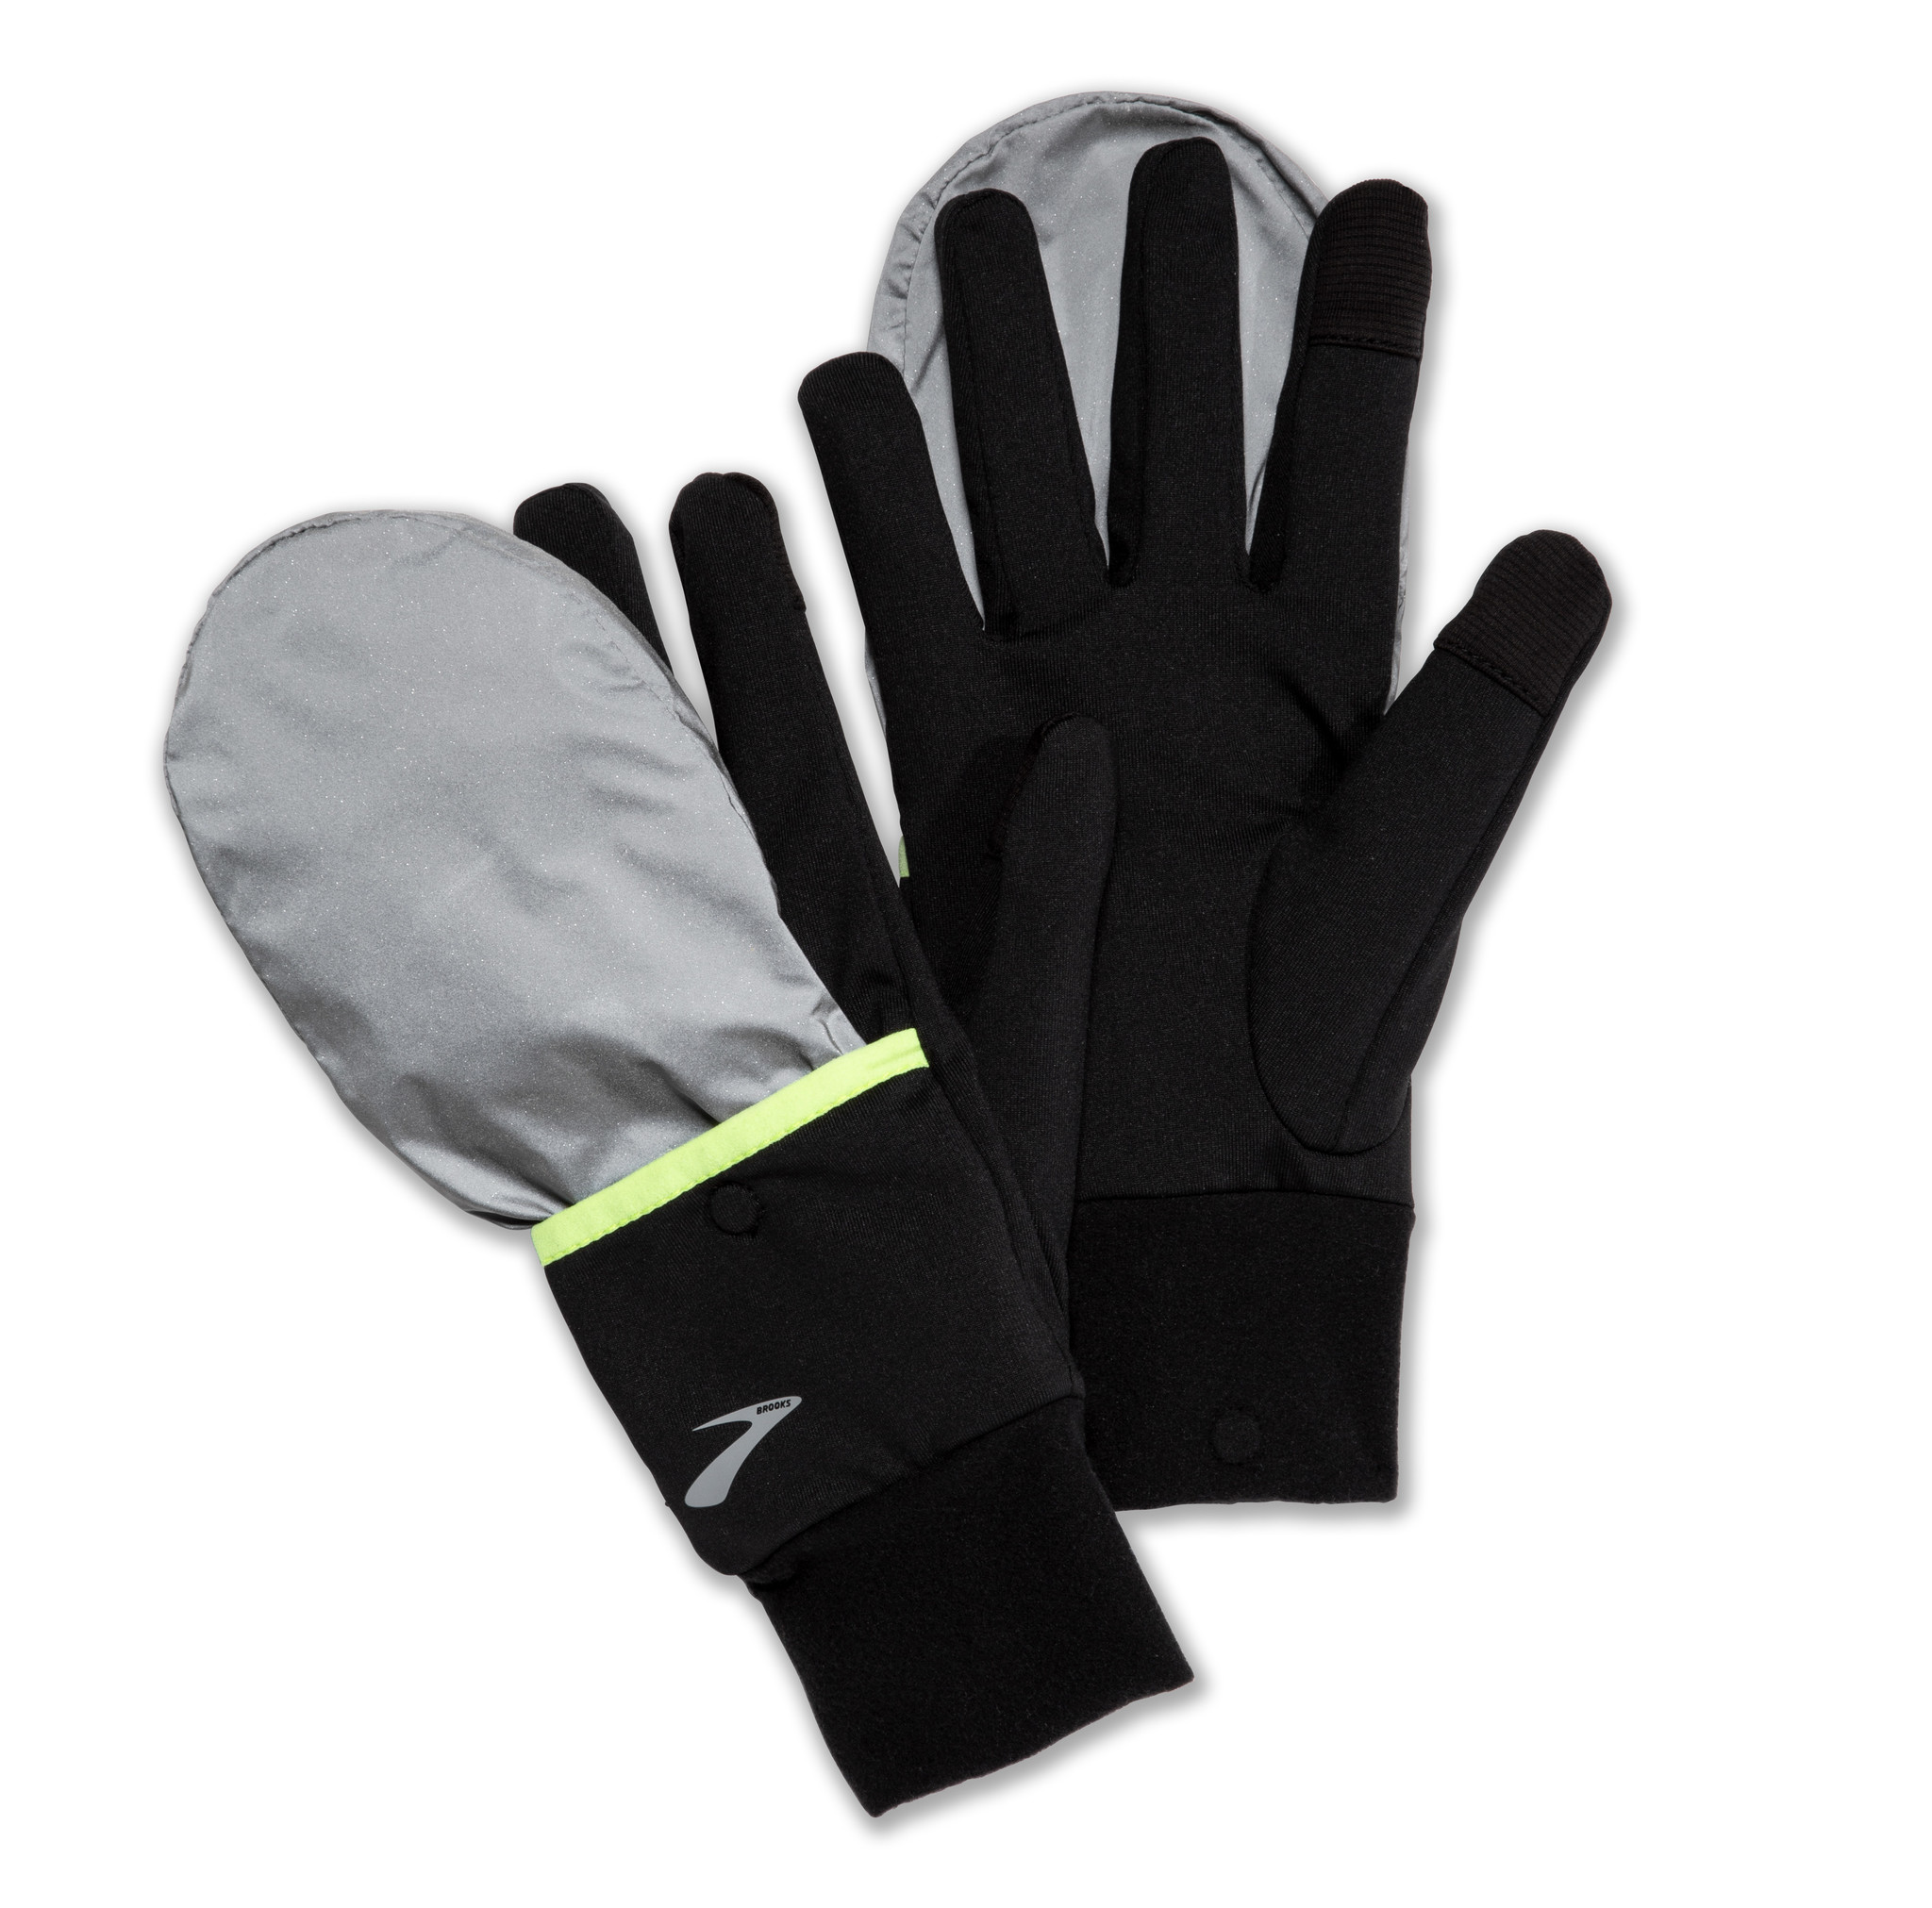 Brooks Brooks Nightlife Glove, Black/Reflective